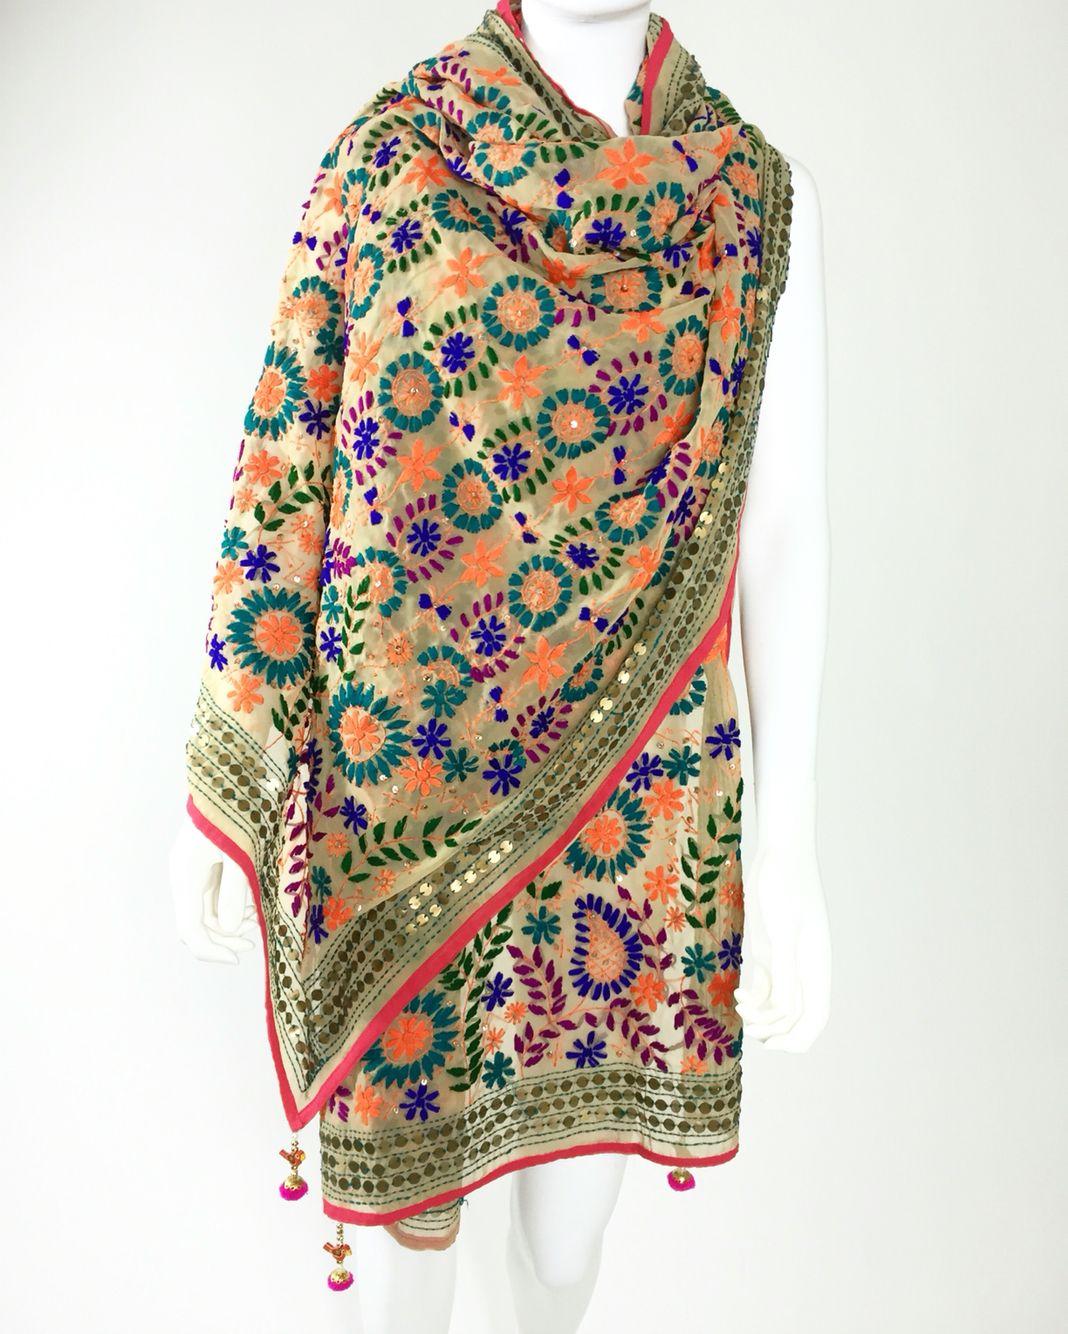 Punjabi Hand Embroidery Phulkari Faux Chiffon Dupatta, Stoles, Multicolored and custom designs.